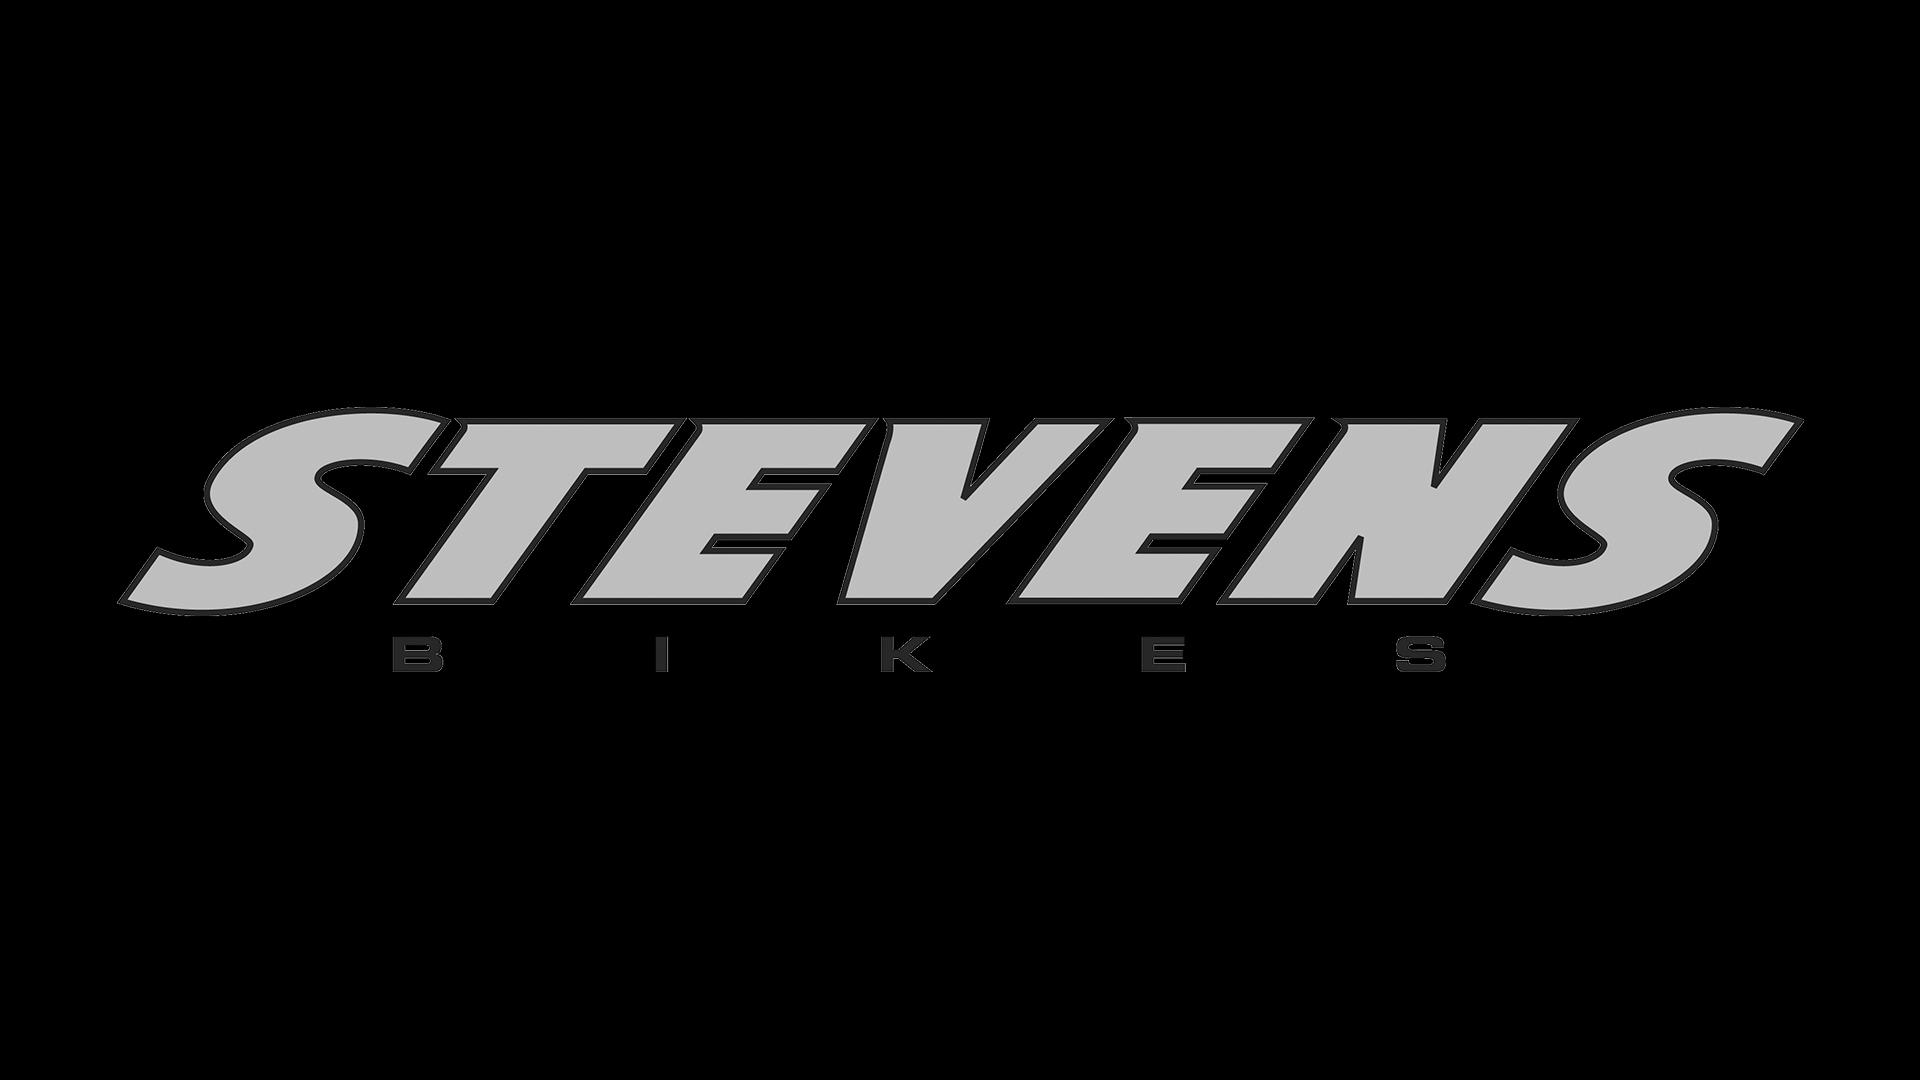 bicicletas-stevens-bikes